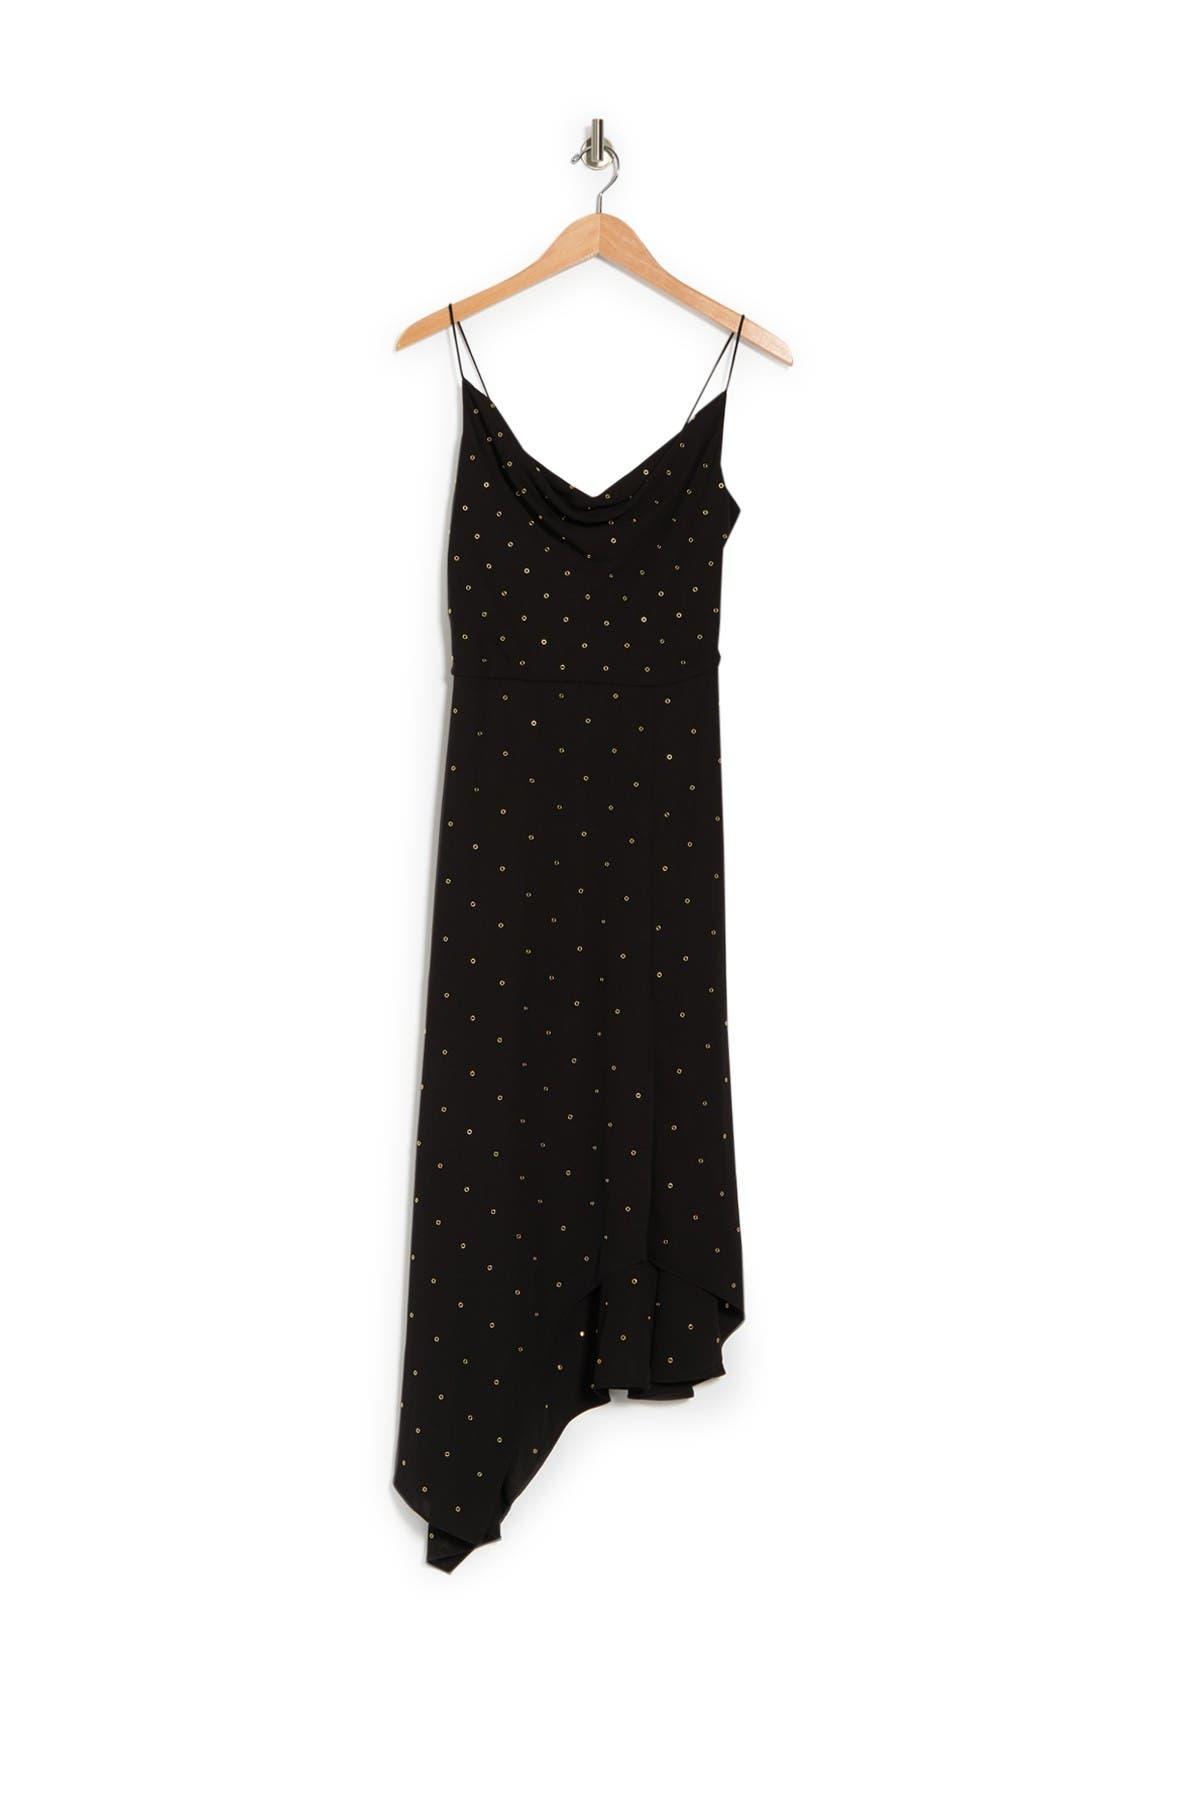 Image of VERONICA BEARD Heera Dotted Print Asymmetrical Hem Dress